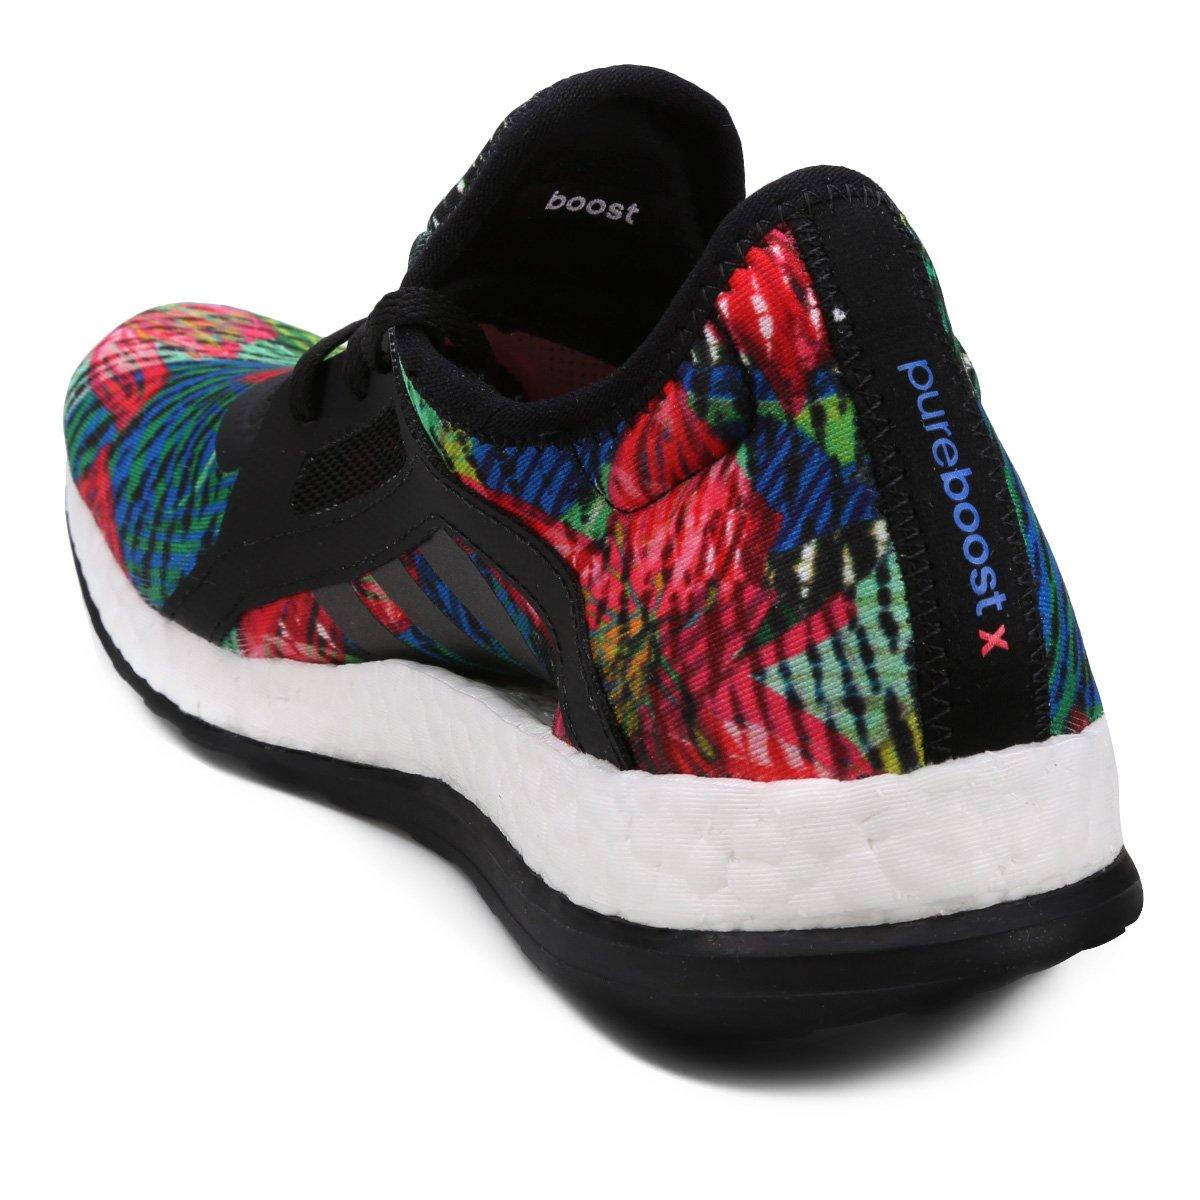 Tênis Adidas Pure Boost X Feminino - Compre Agora  b1b01c2805a9a